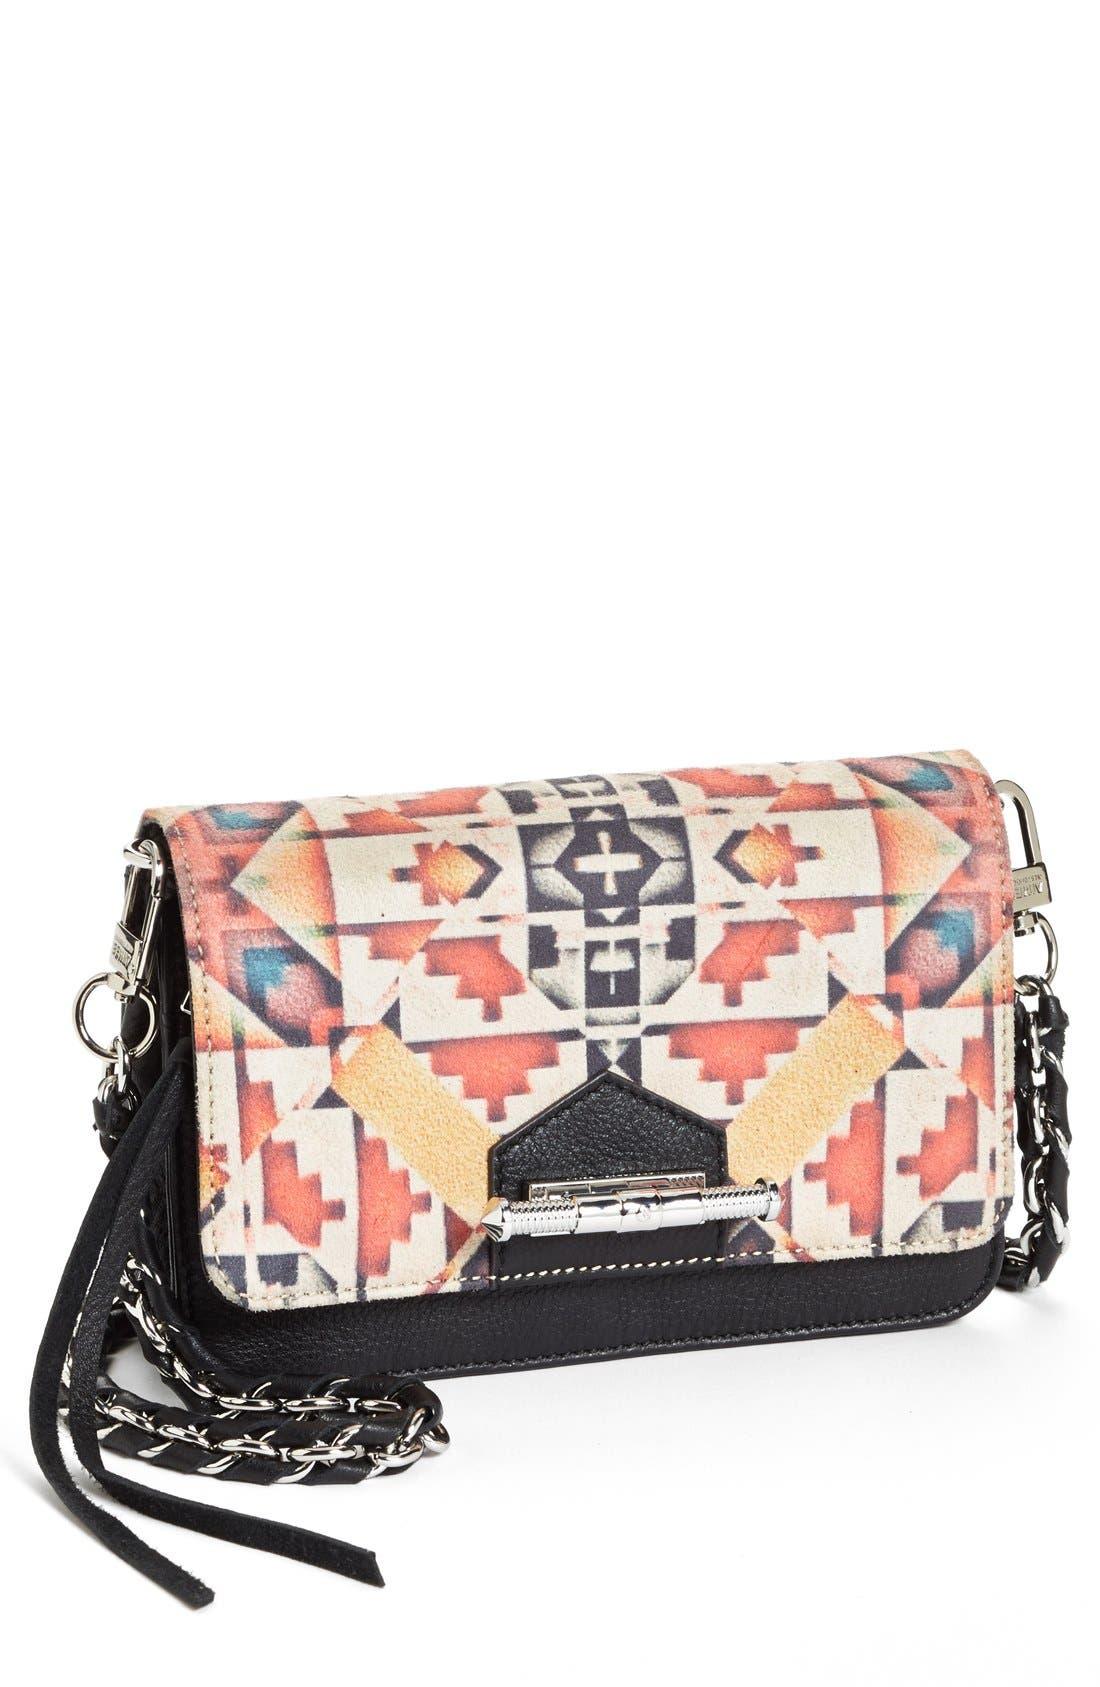 Alternate Image 1 Selected - Aimee Kestenberg Crossbody Bag